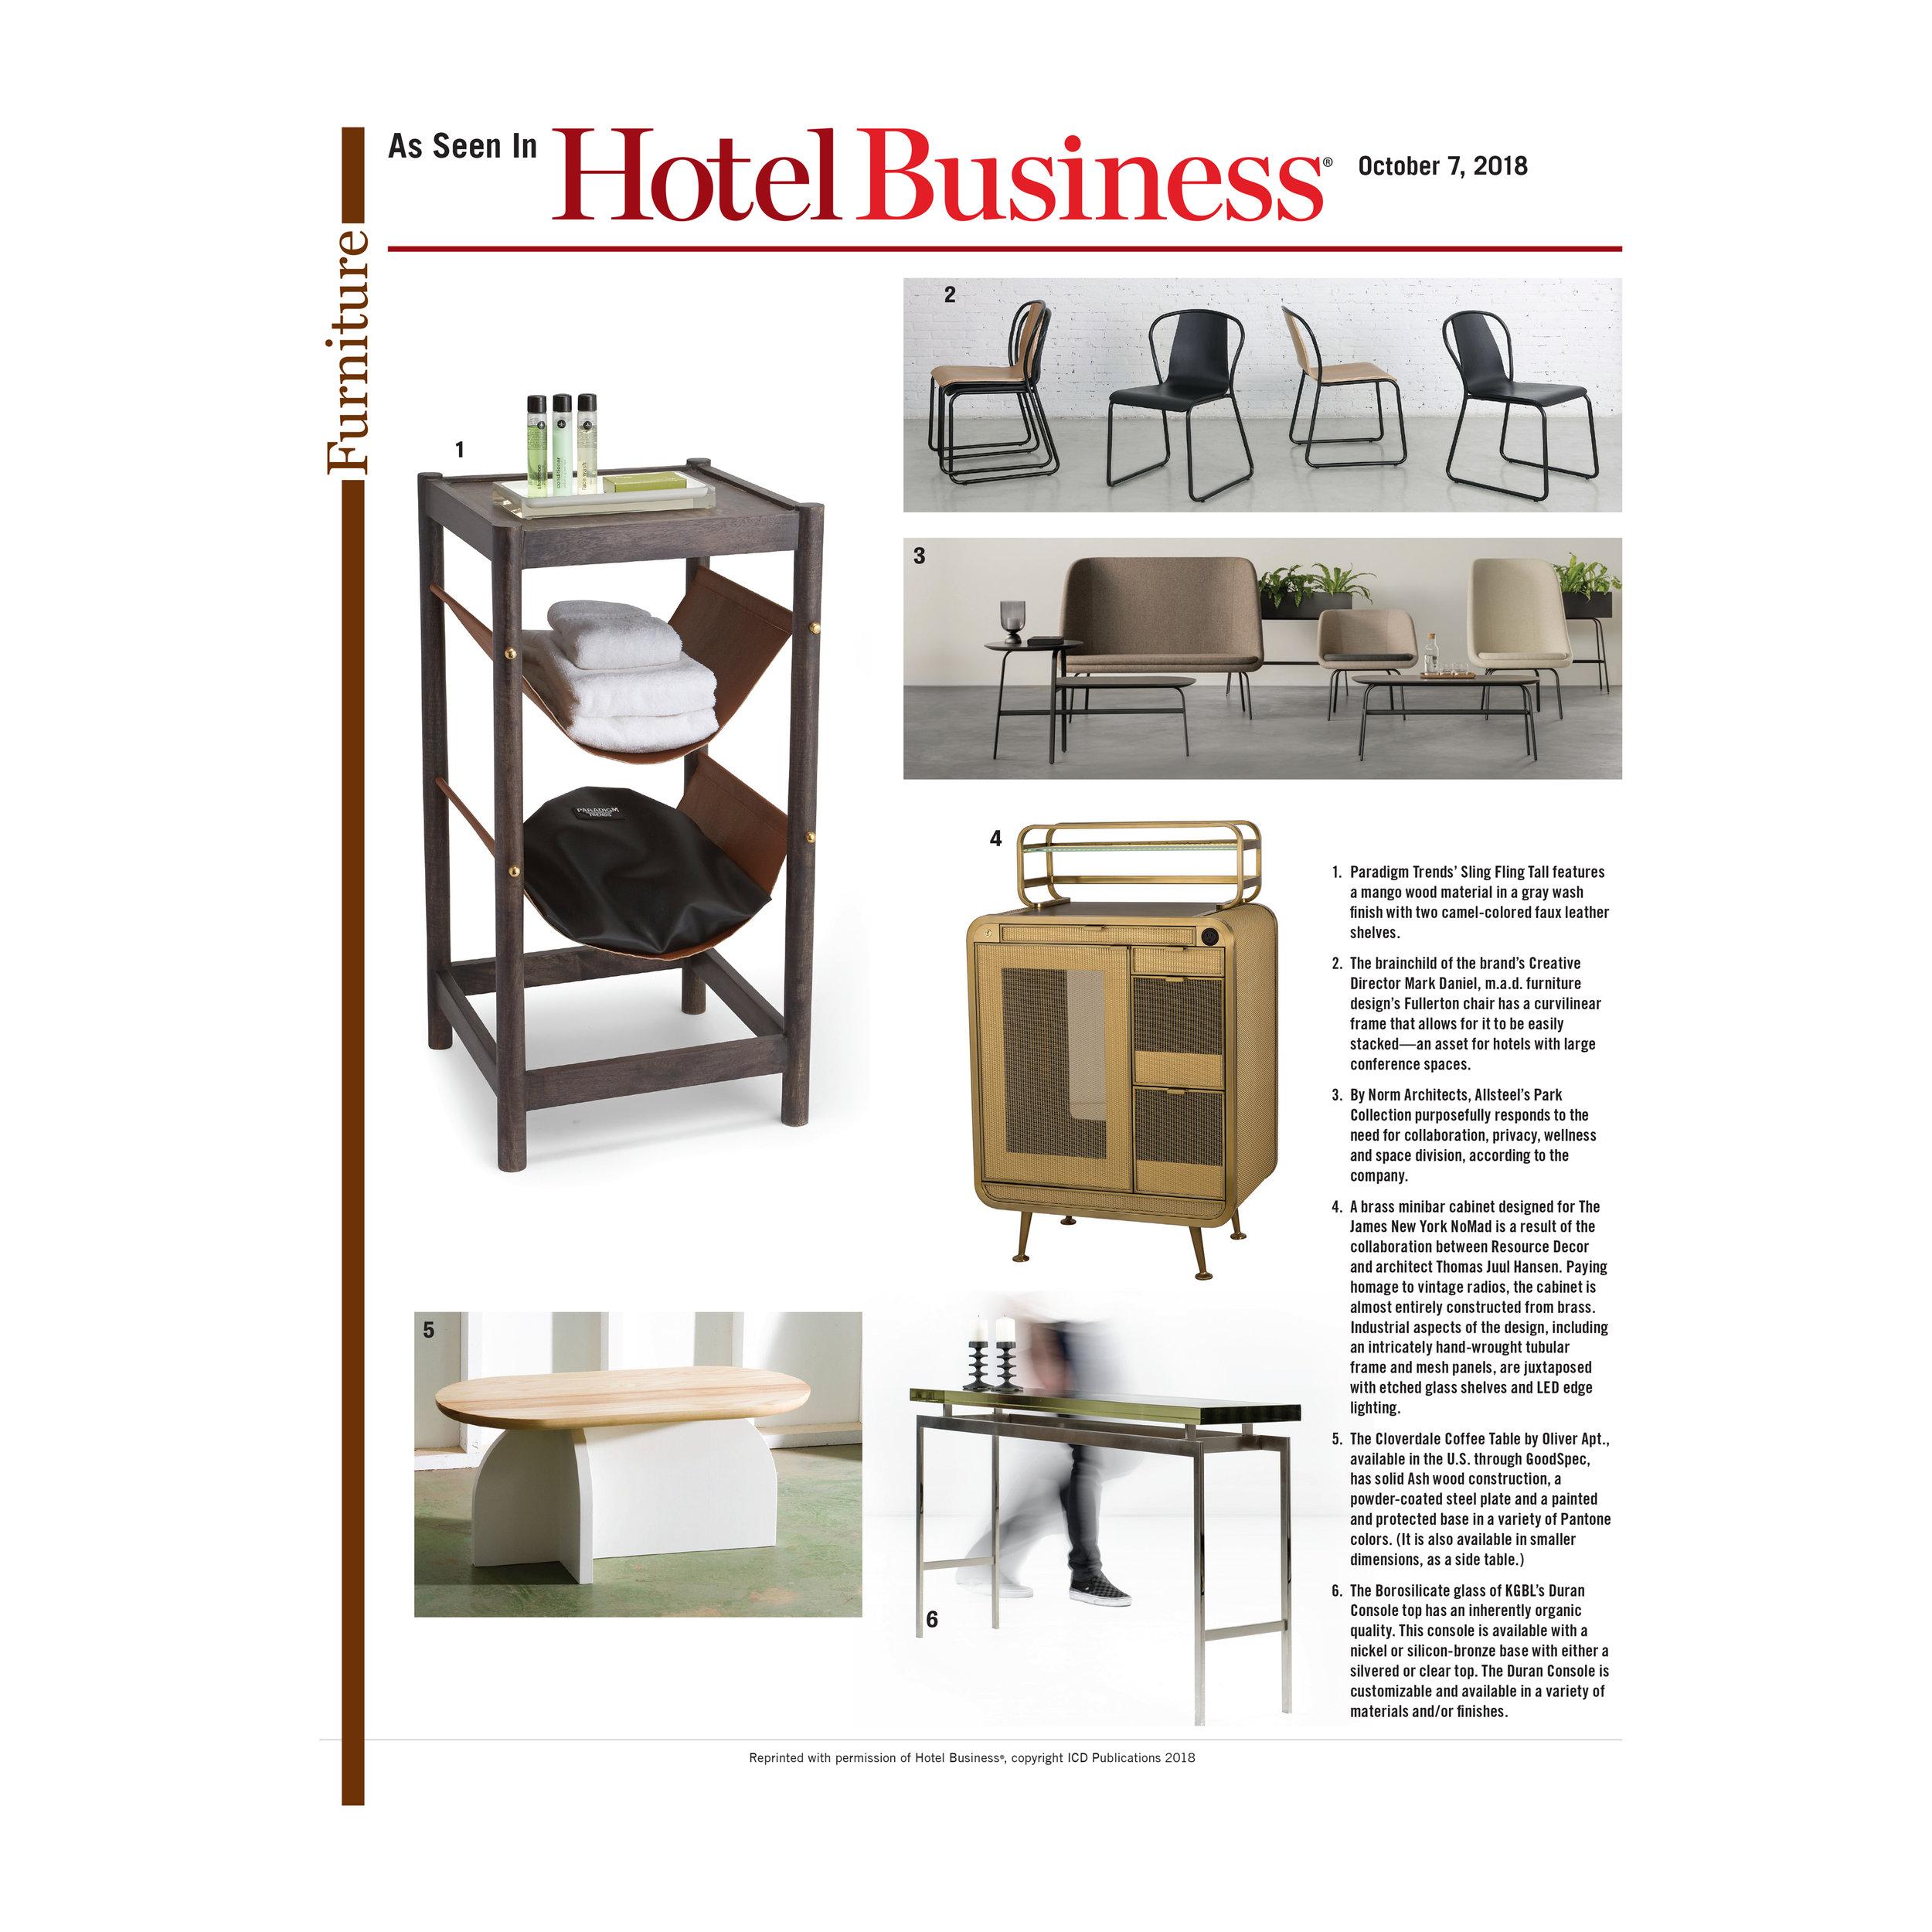 Hotel Business 10-7-18.jpg